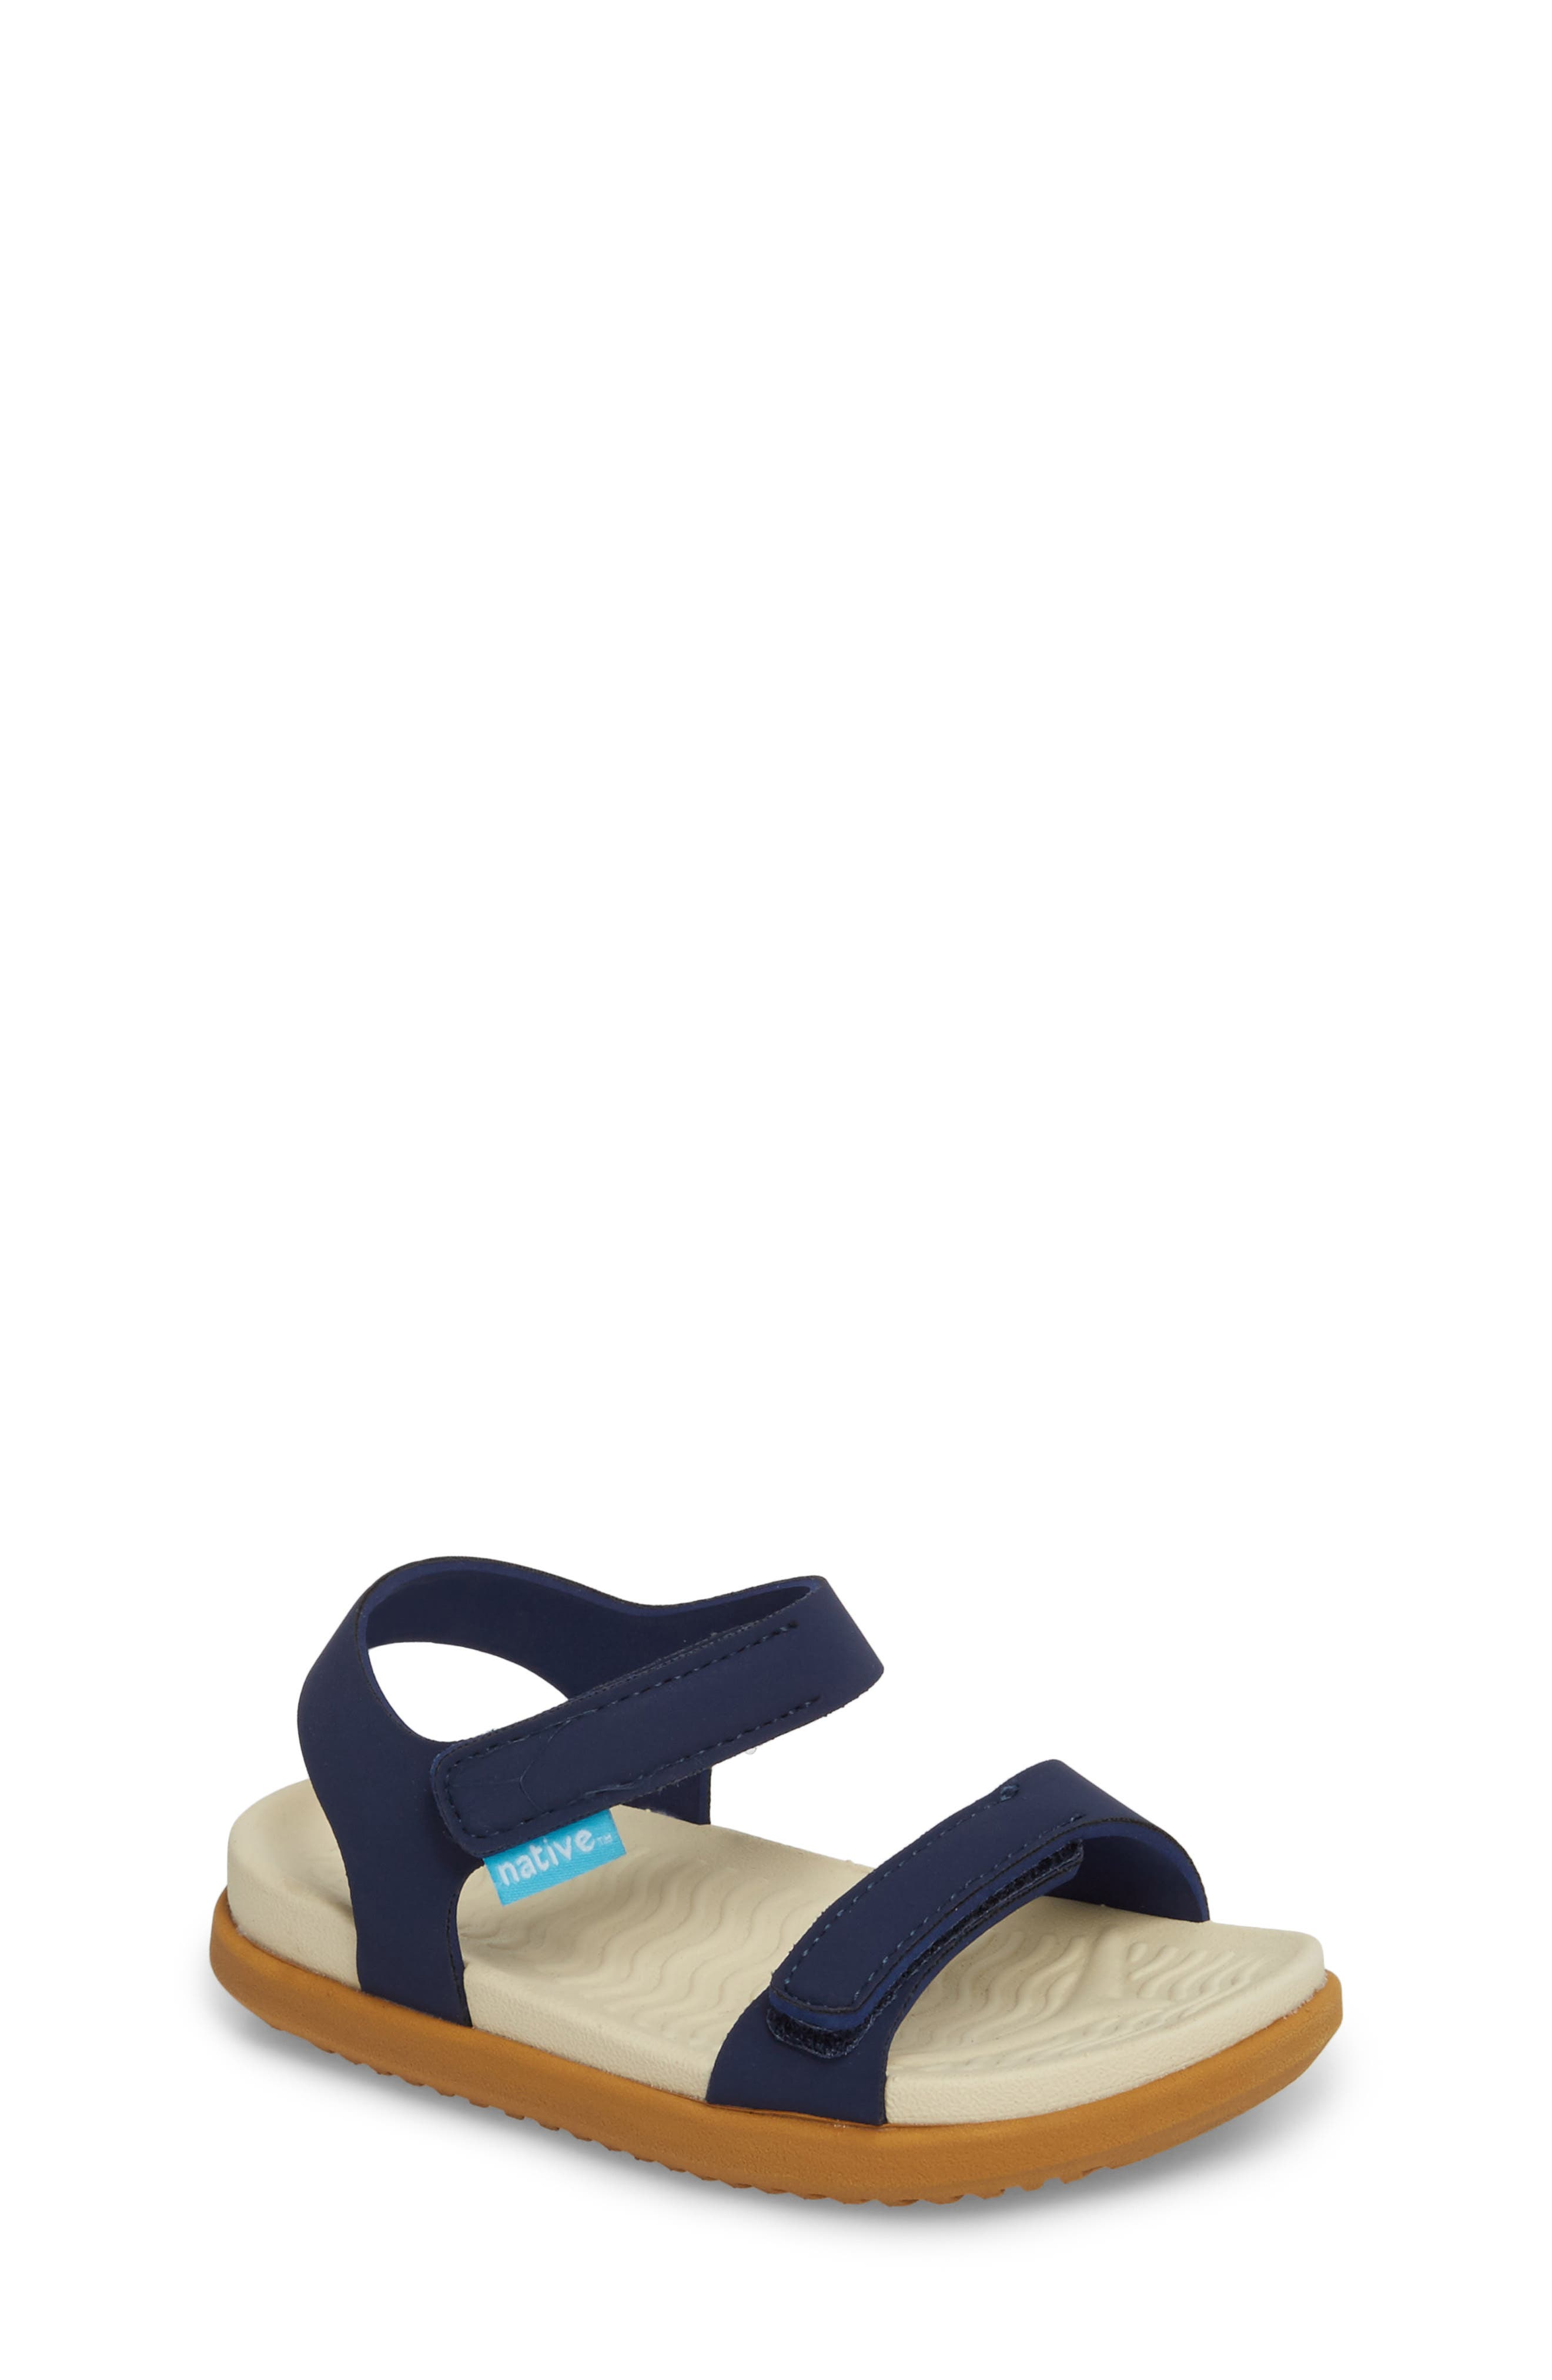 Charley Child Waterproof Flat Sandal,                             Main thumbnail 1, color,                             Blue/ Bone White/ Toffee